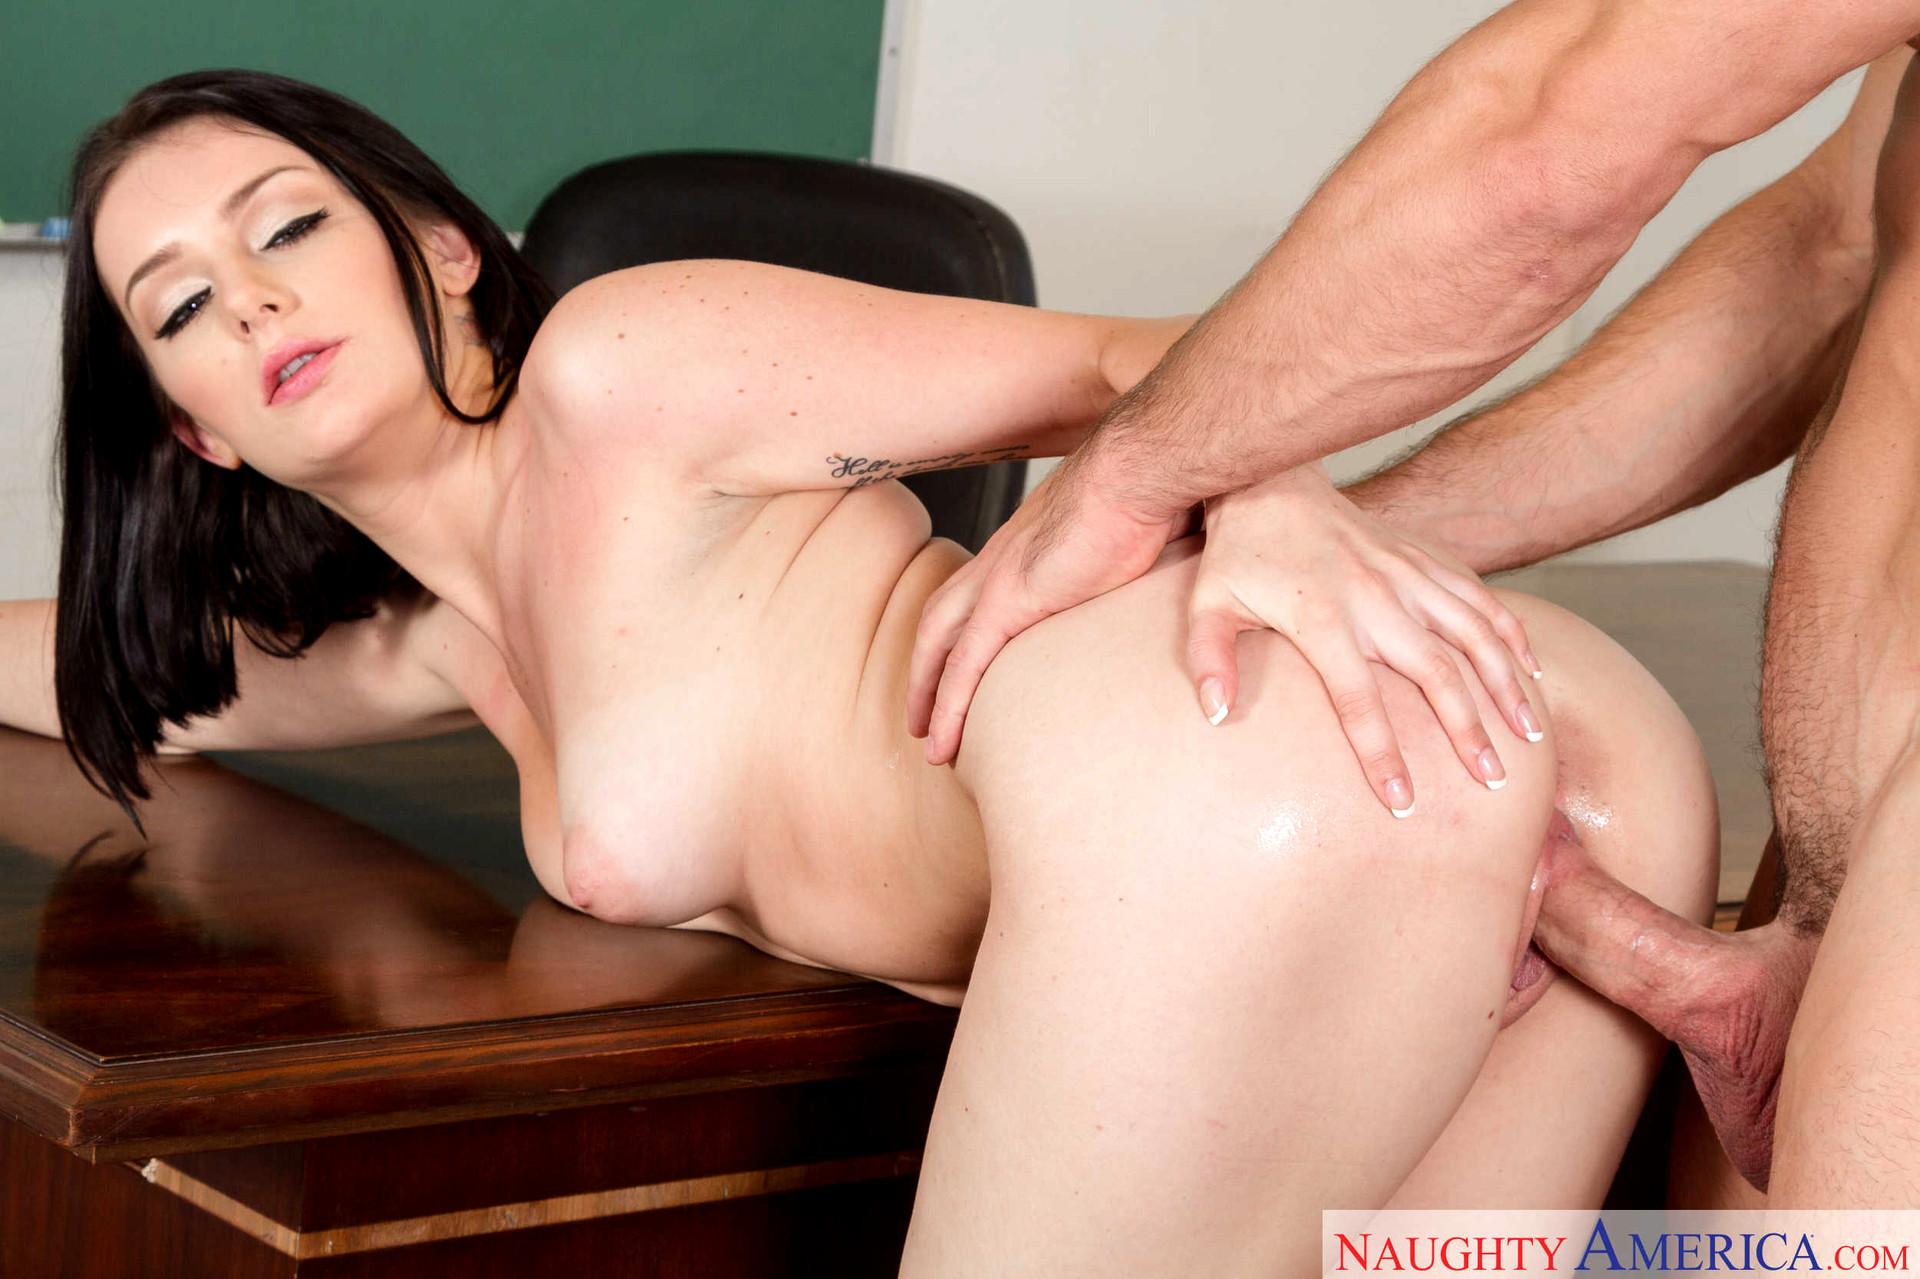 Amanda Lane Nude download sex pics naughty america amanda lane platinum